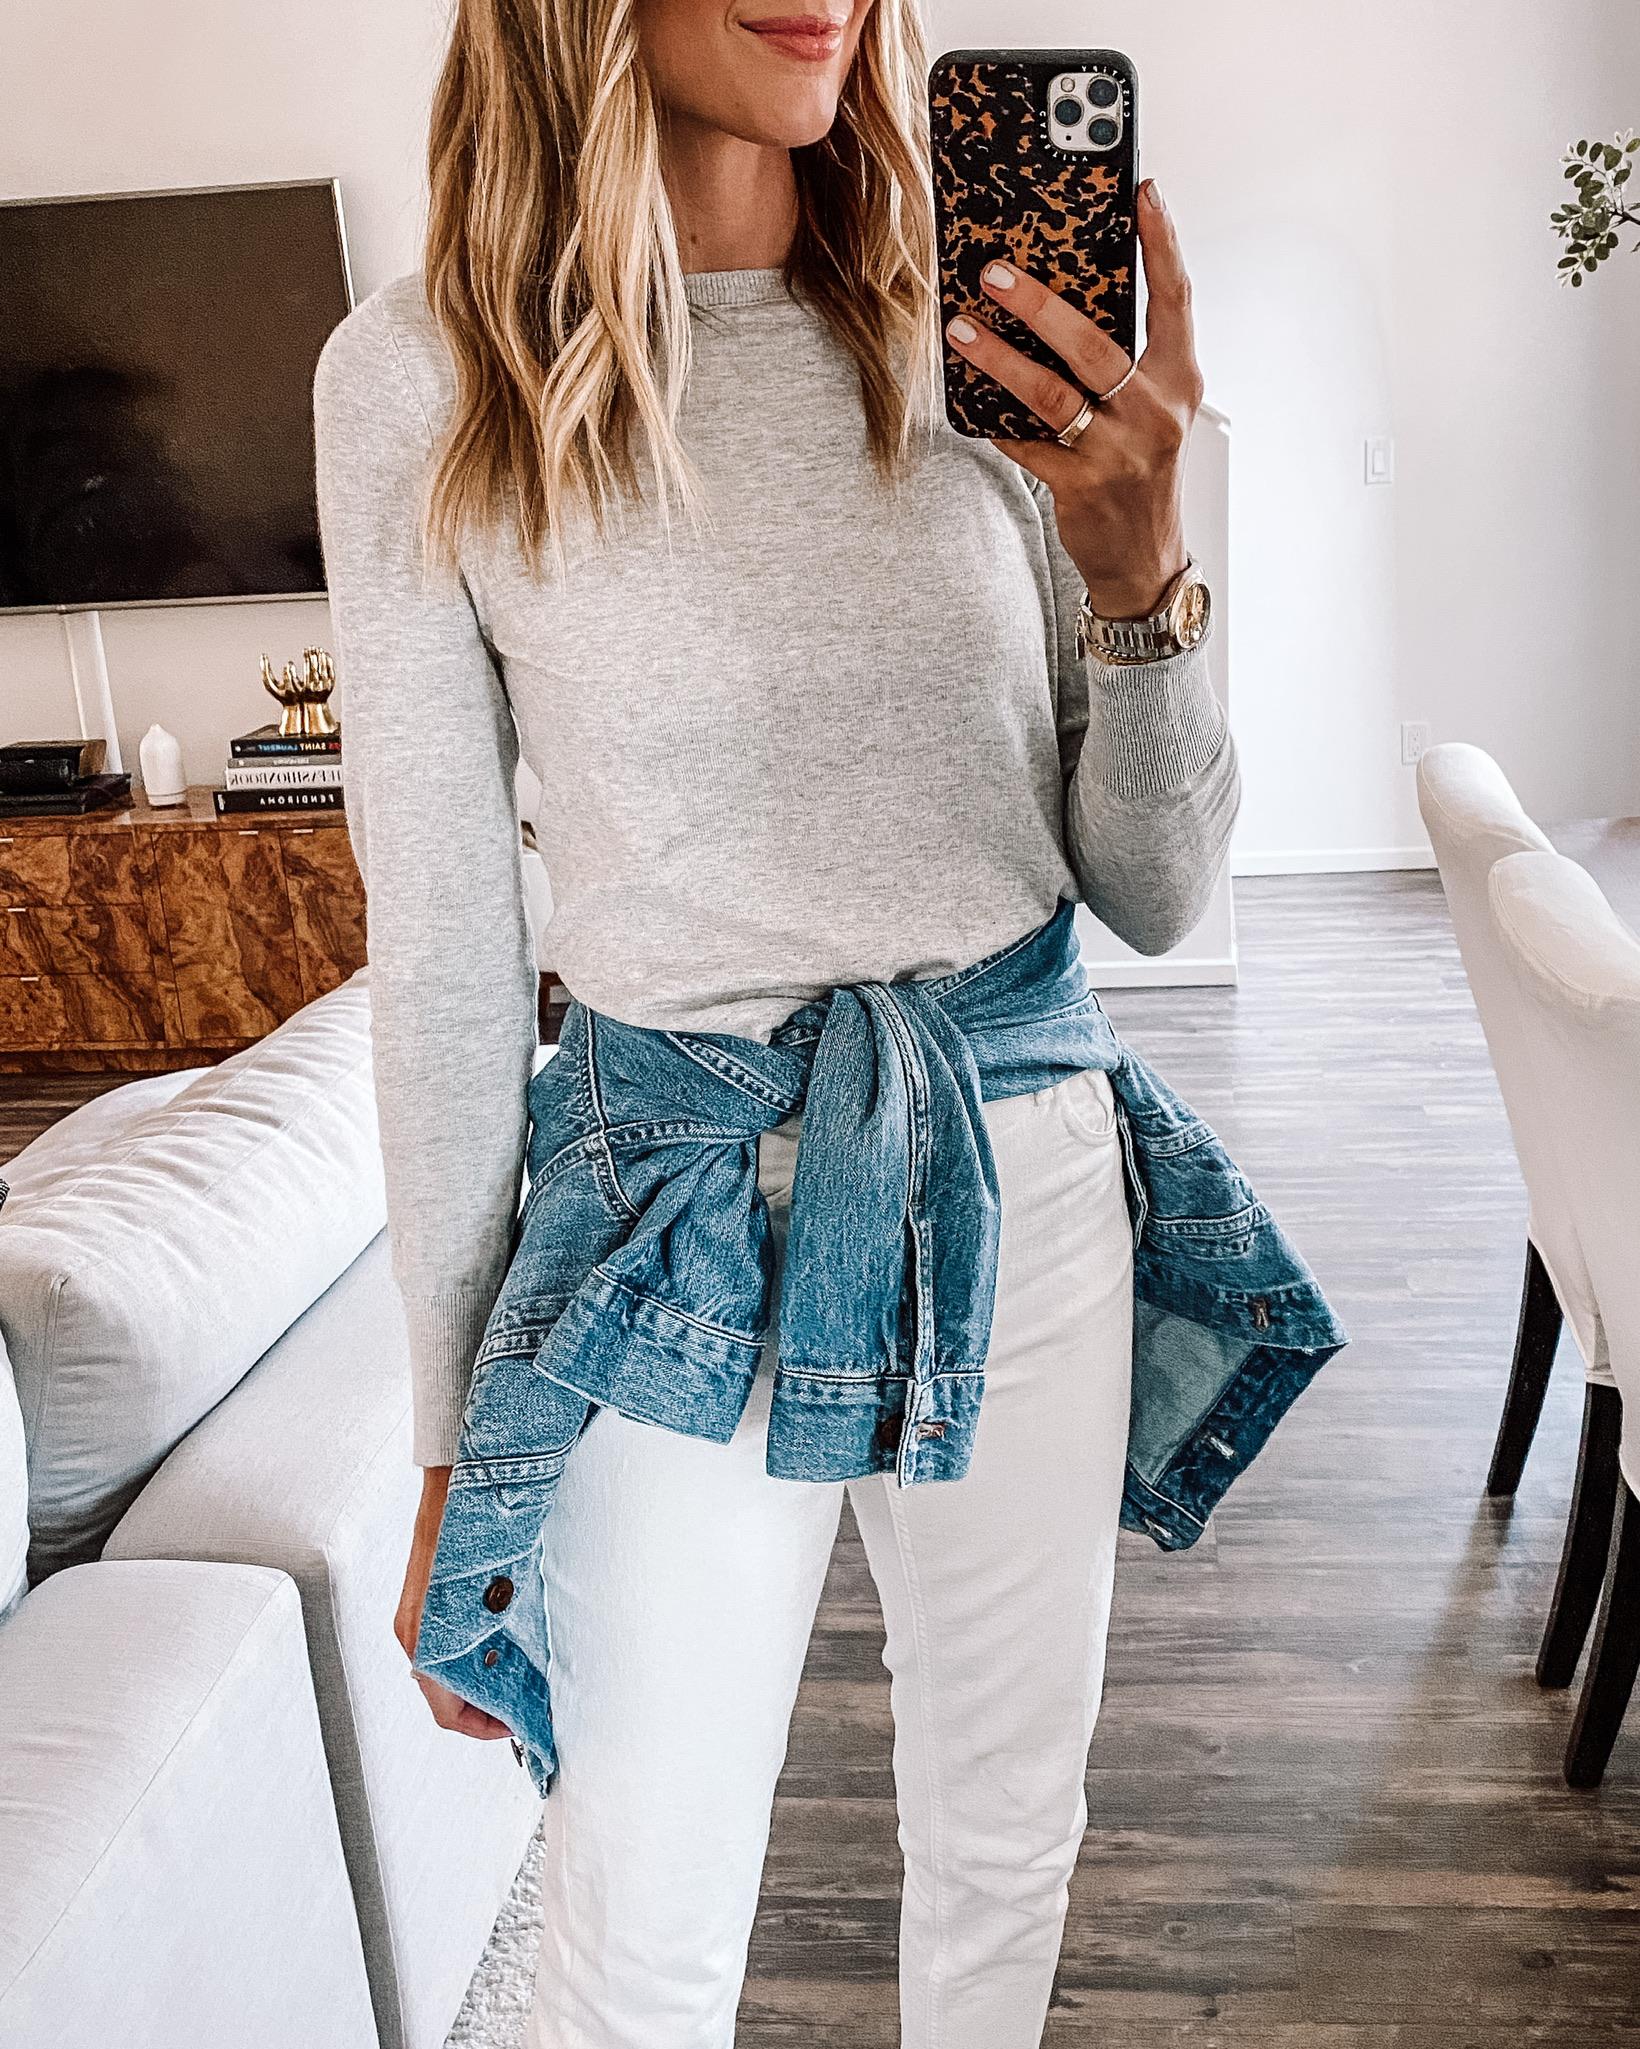 Fashion Jackson Wearing Grey Sweater Denim Jacket White Jeans